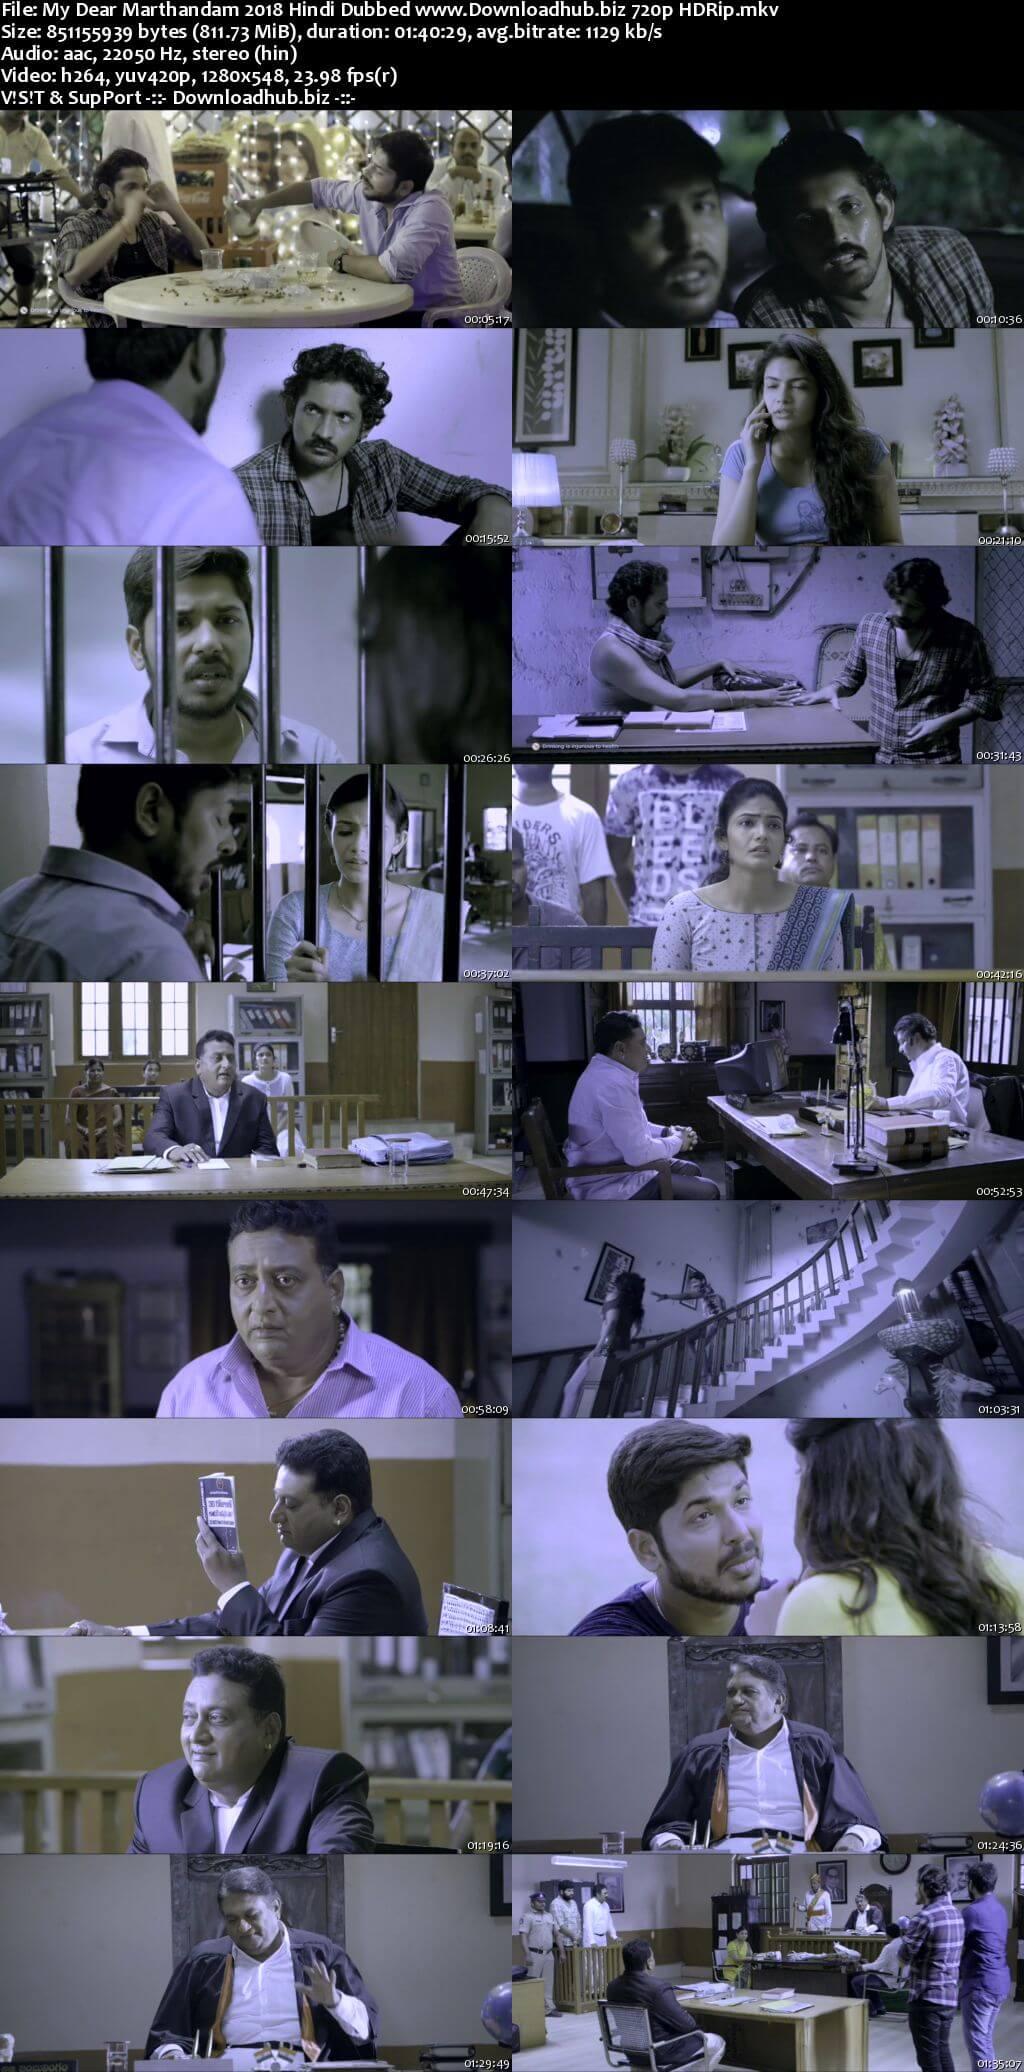 My Dear Marthandam 2018 Hindi Dubbed 720p HDRip x264